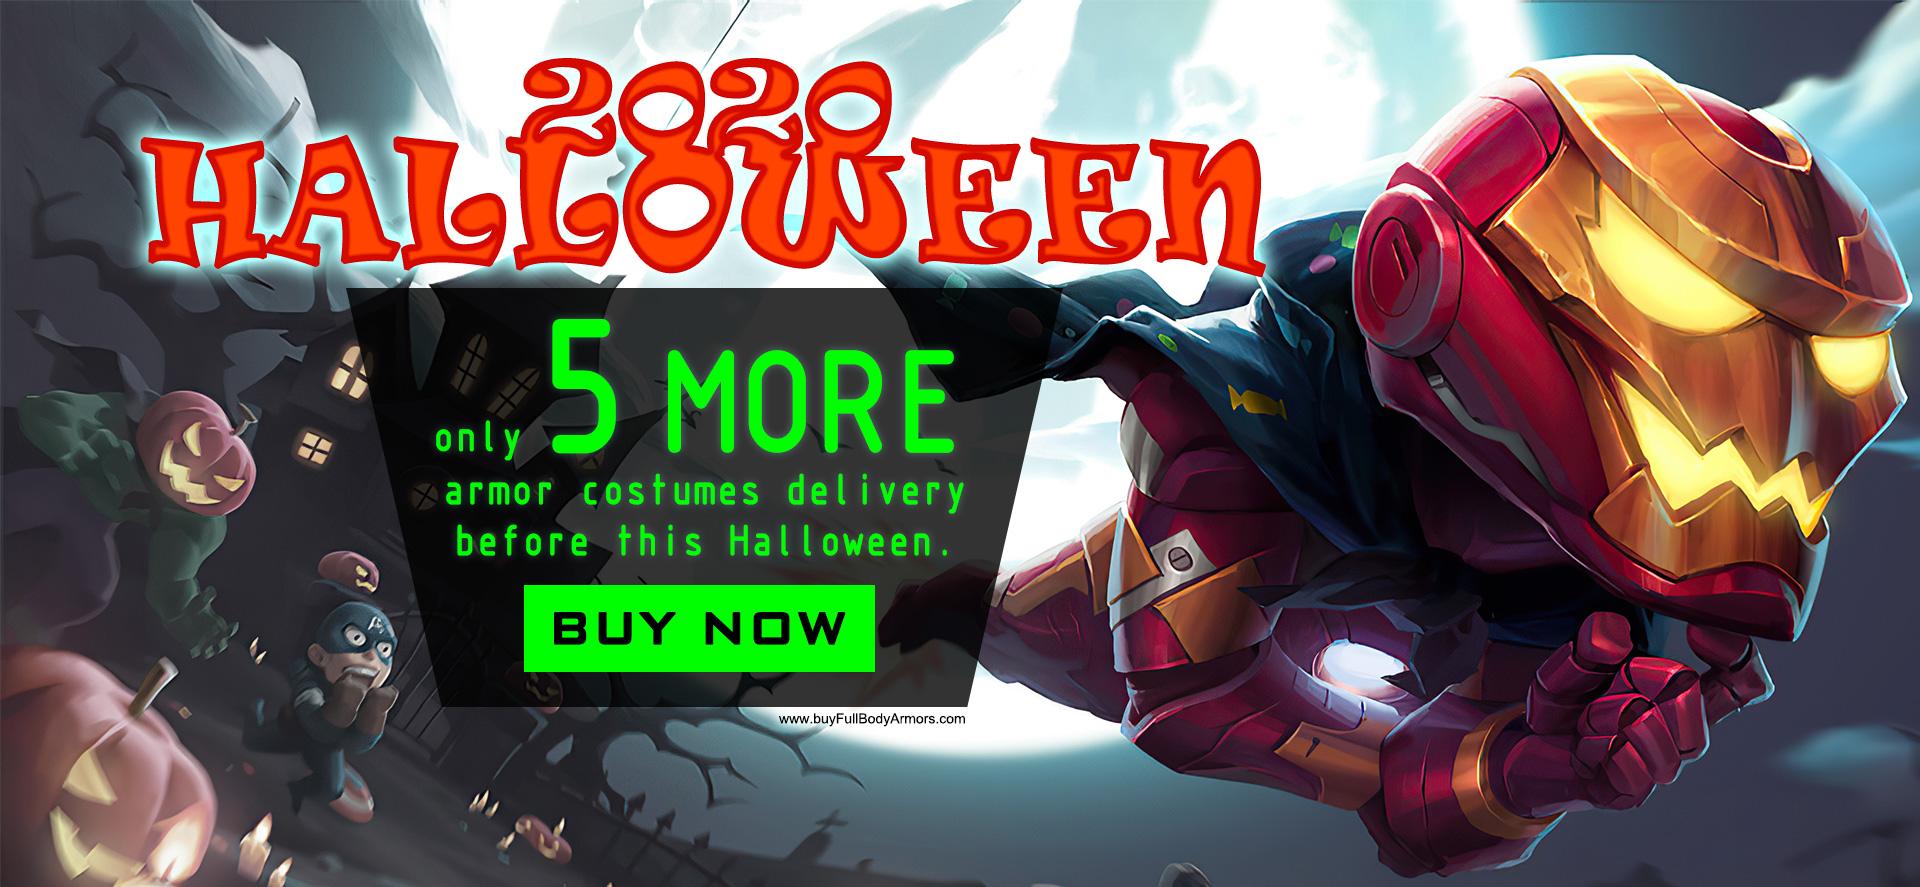 Halloween 2020 Iron Man armor suit costume